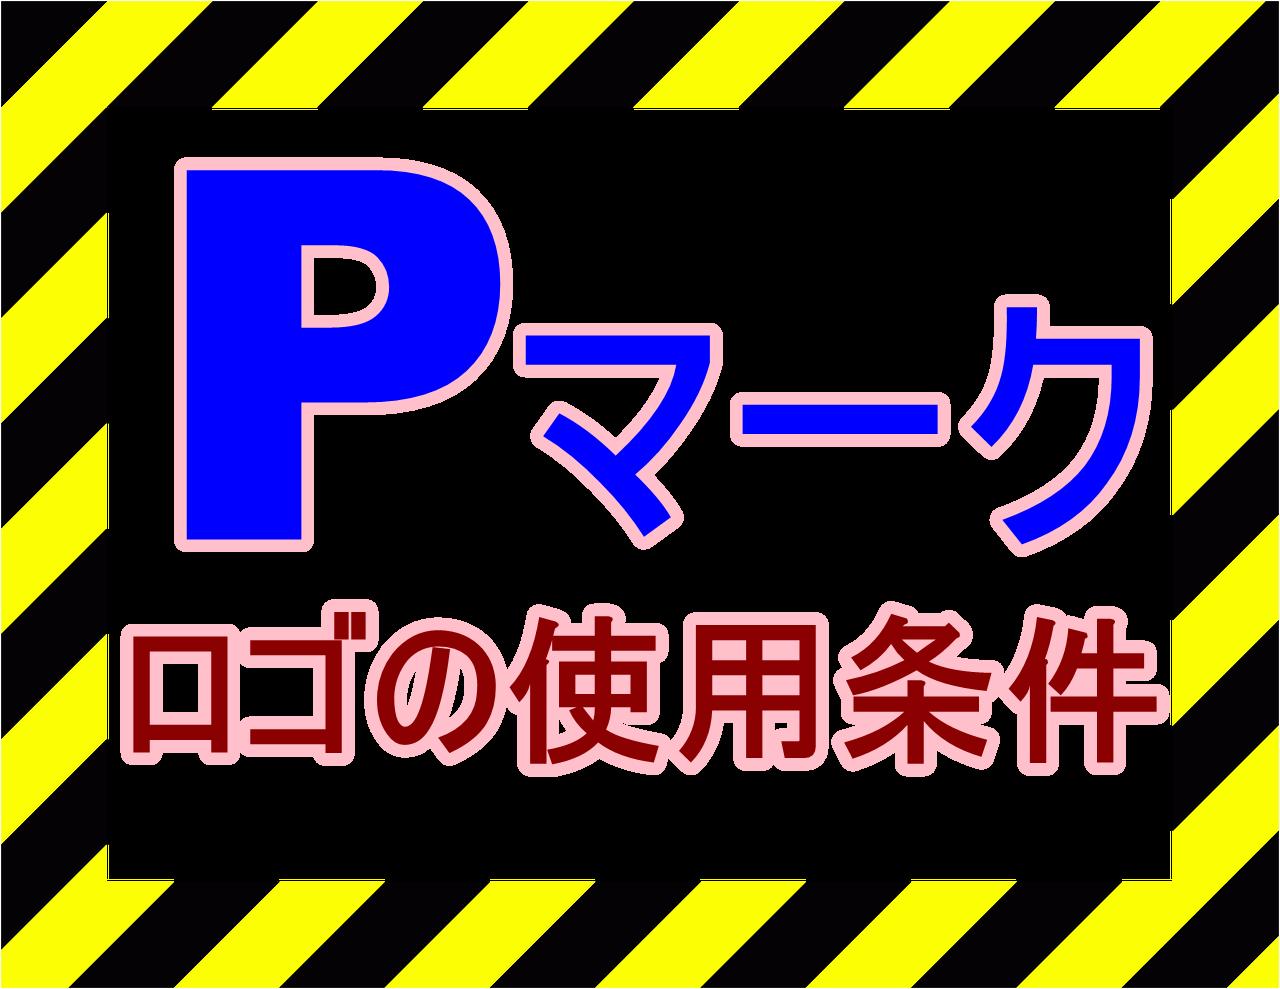 Pマーク(プライバシーマーク)ロゴの使用条件とは【取得後の注意】